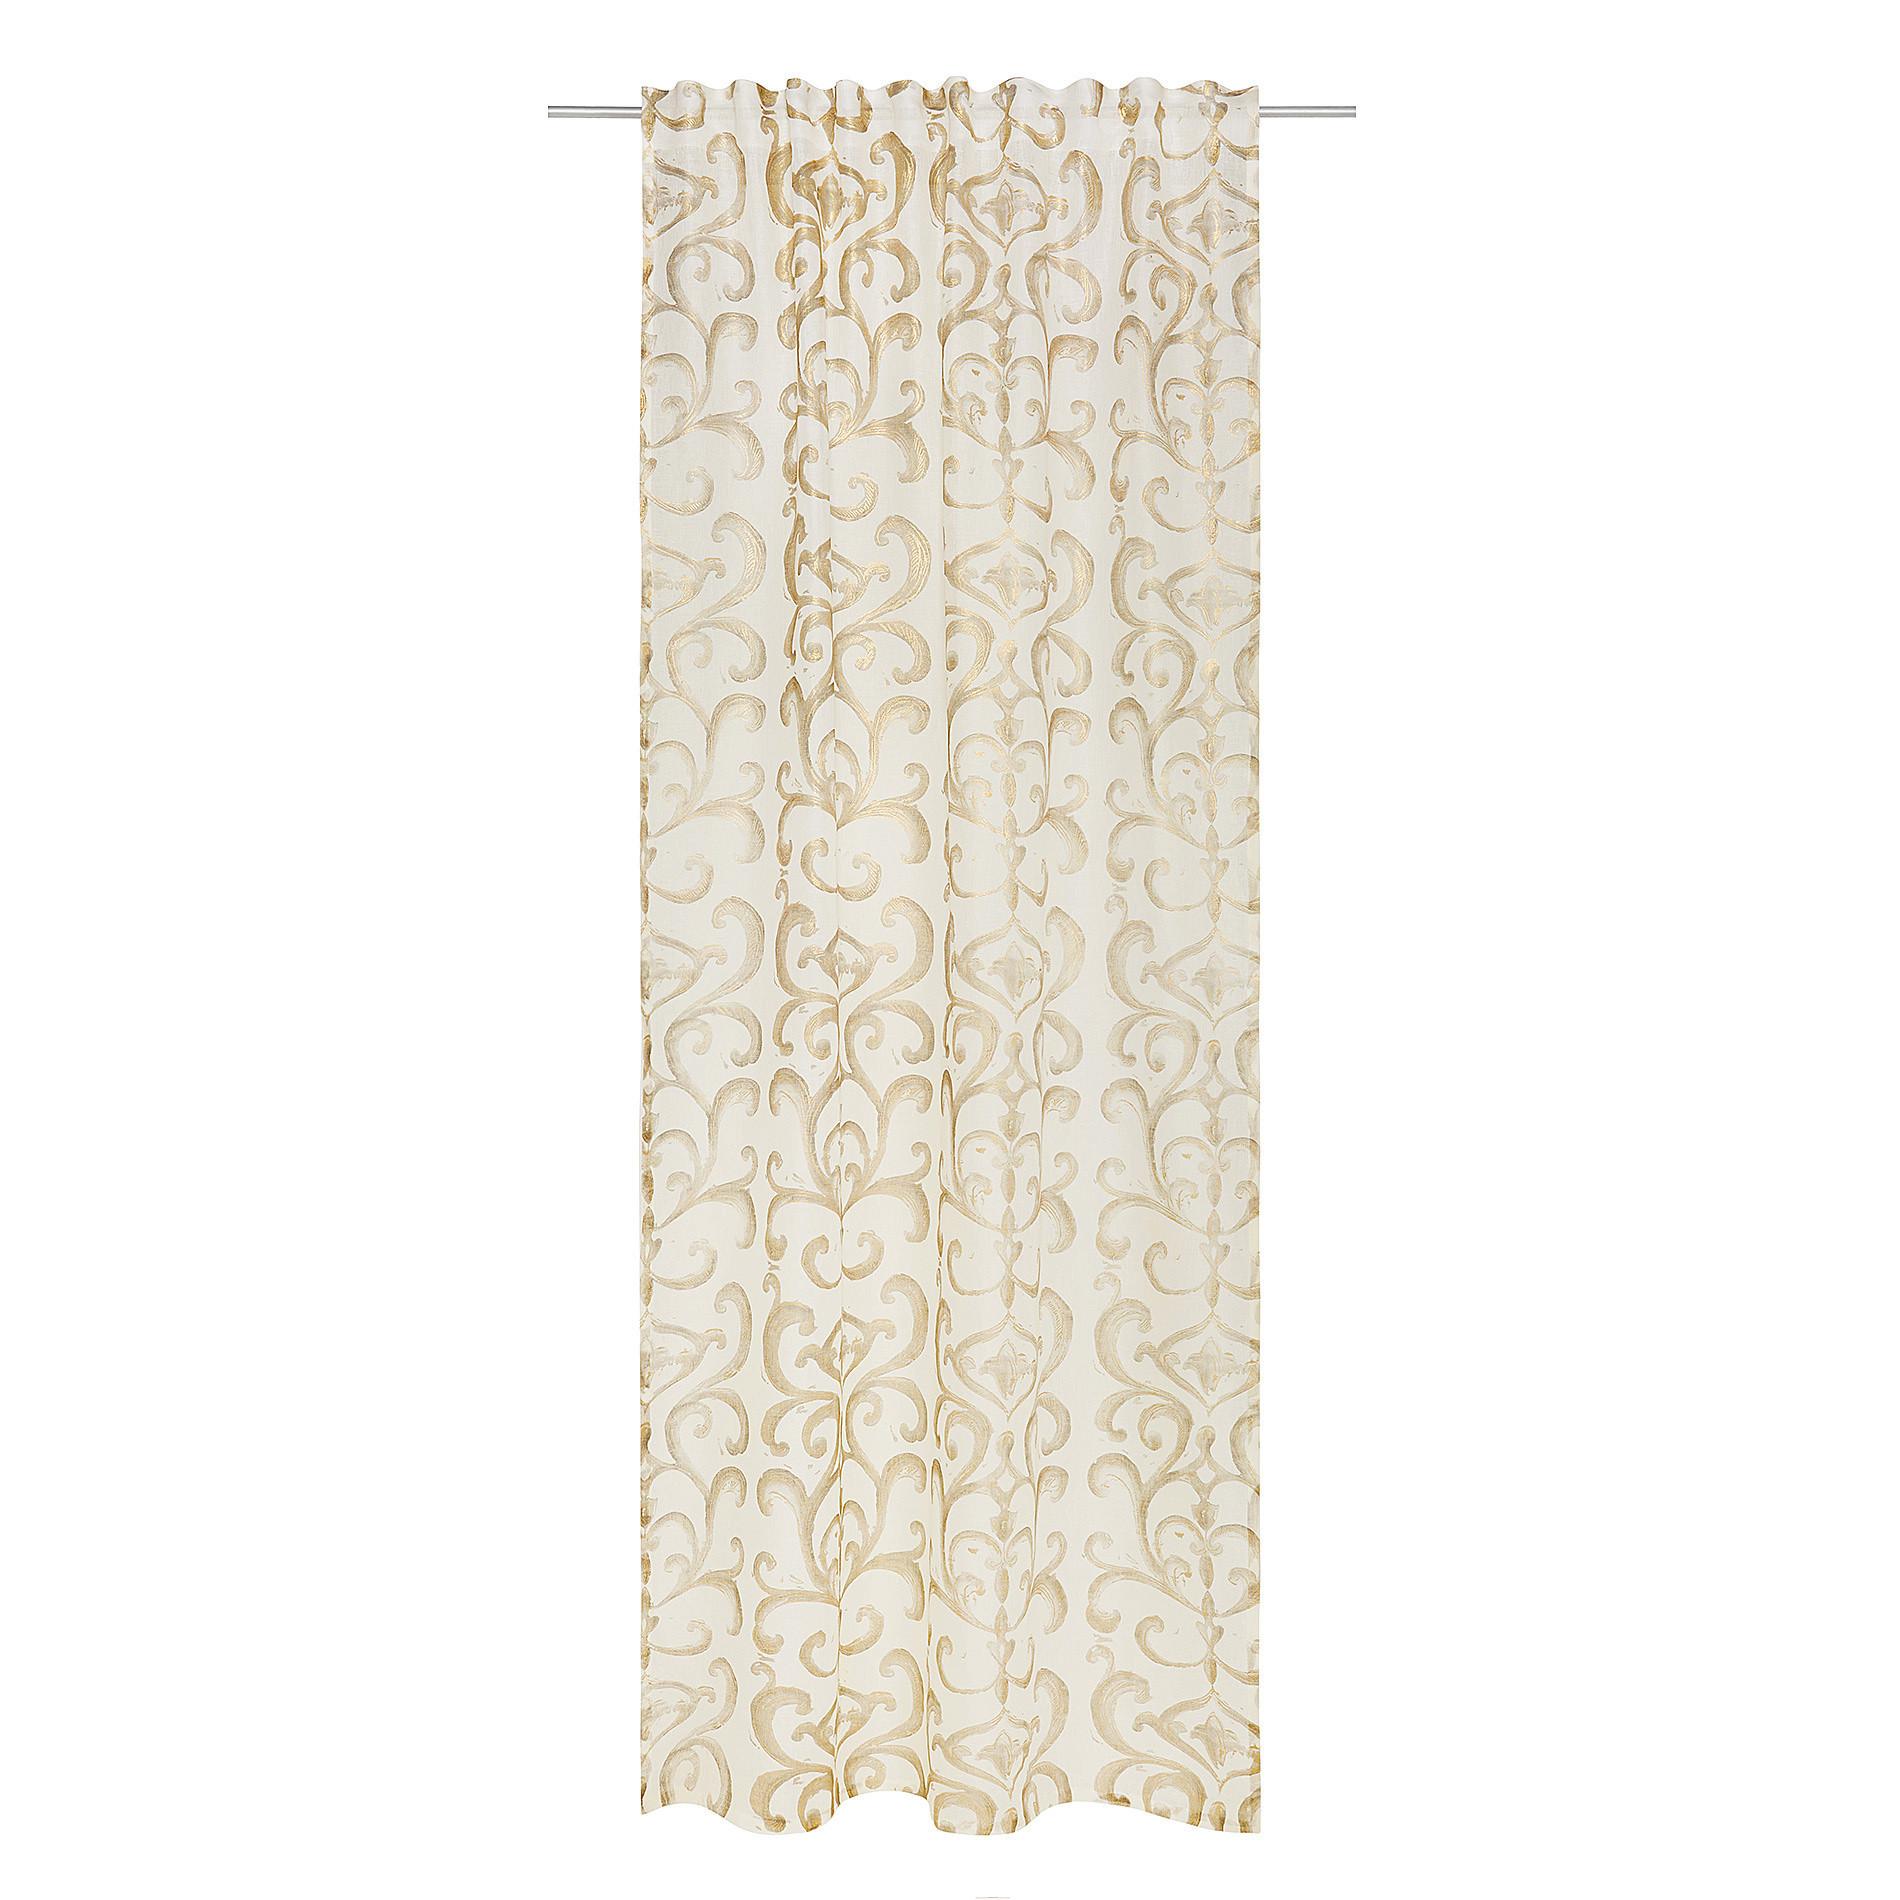 Tenda puro lino stampa devore, Bianco/Oro, large image number 1